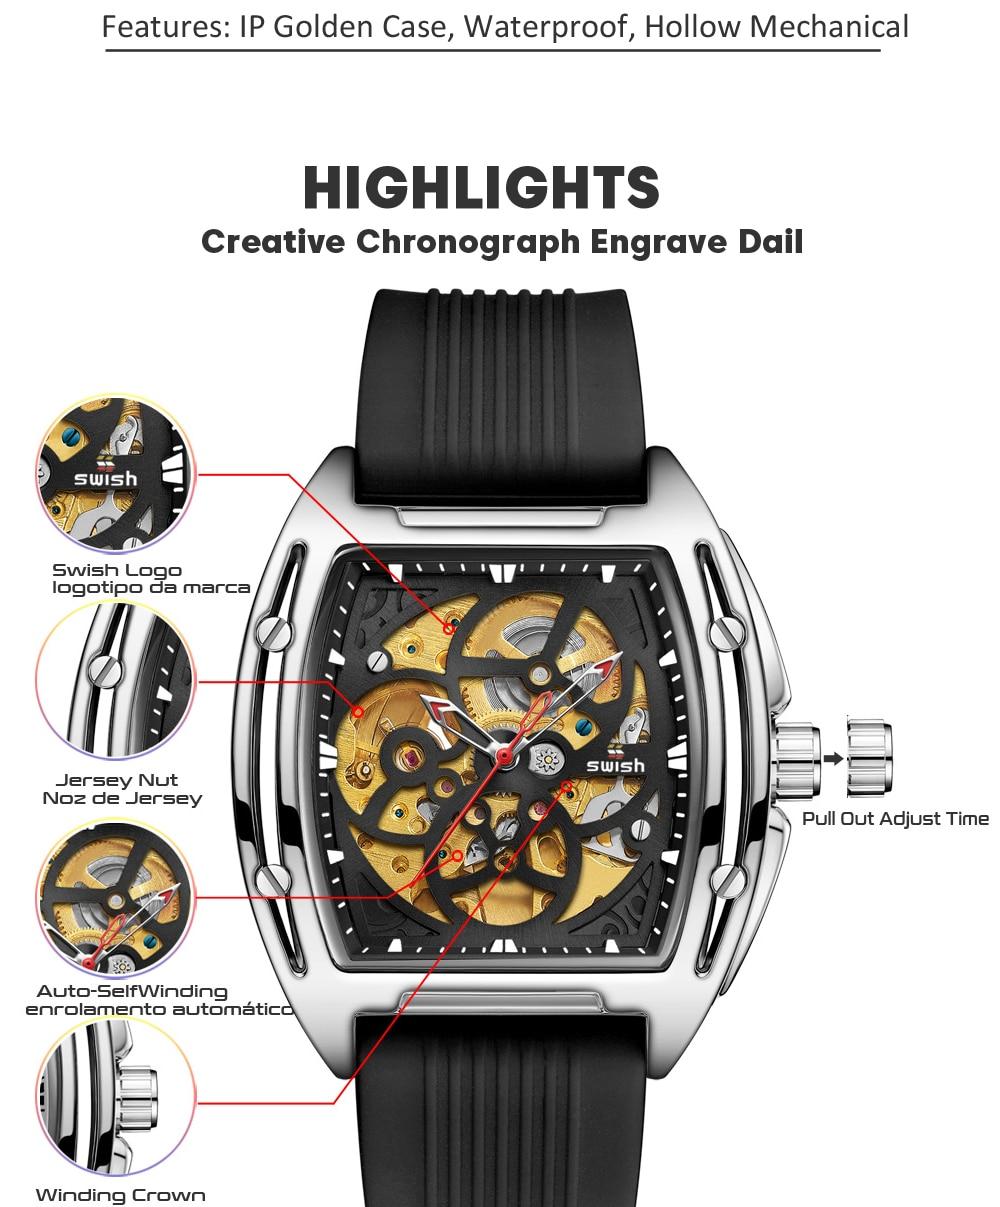 Hc02819a9affc4db185d77b3a0bffed2bR SWISH Brand Design Luxury Men's Mechanical Wristwatch